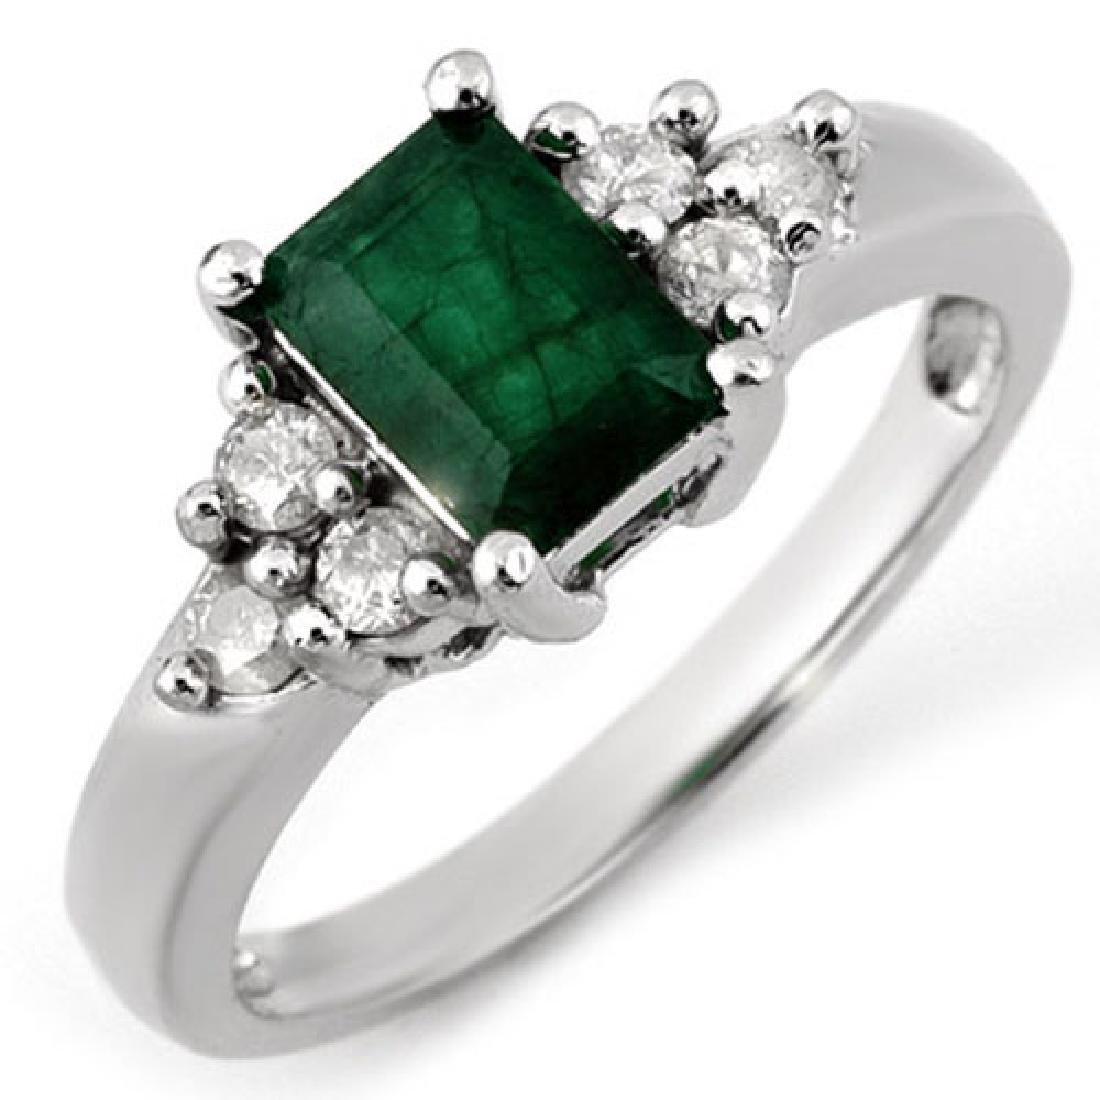 1.36 CTW Emerald & Diamond Ring 10K White Gold